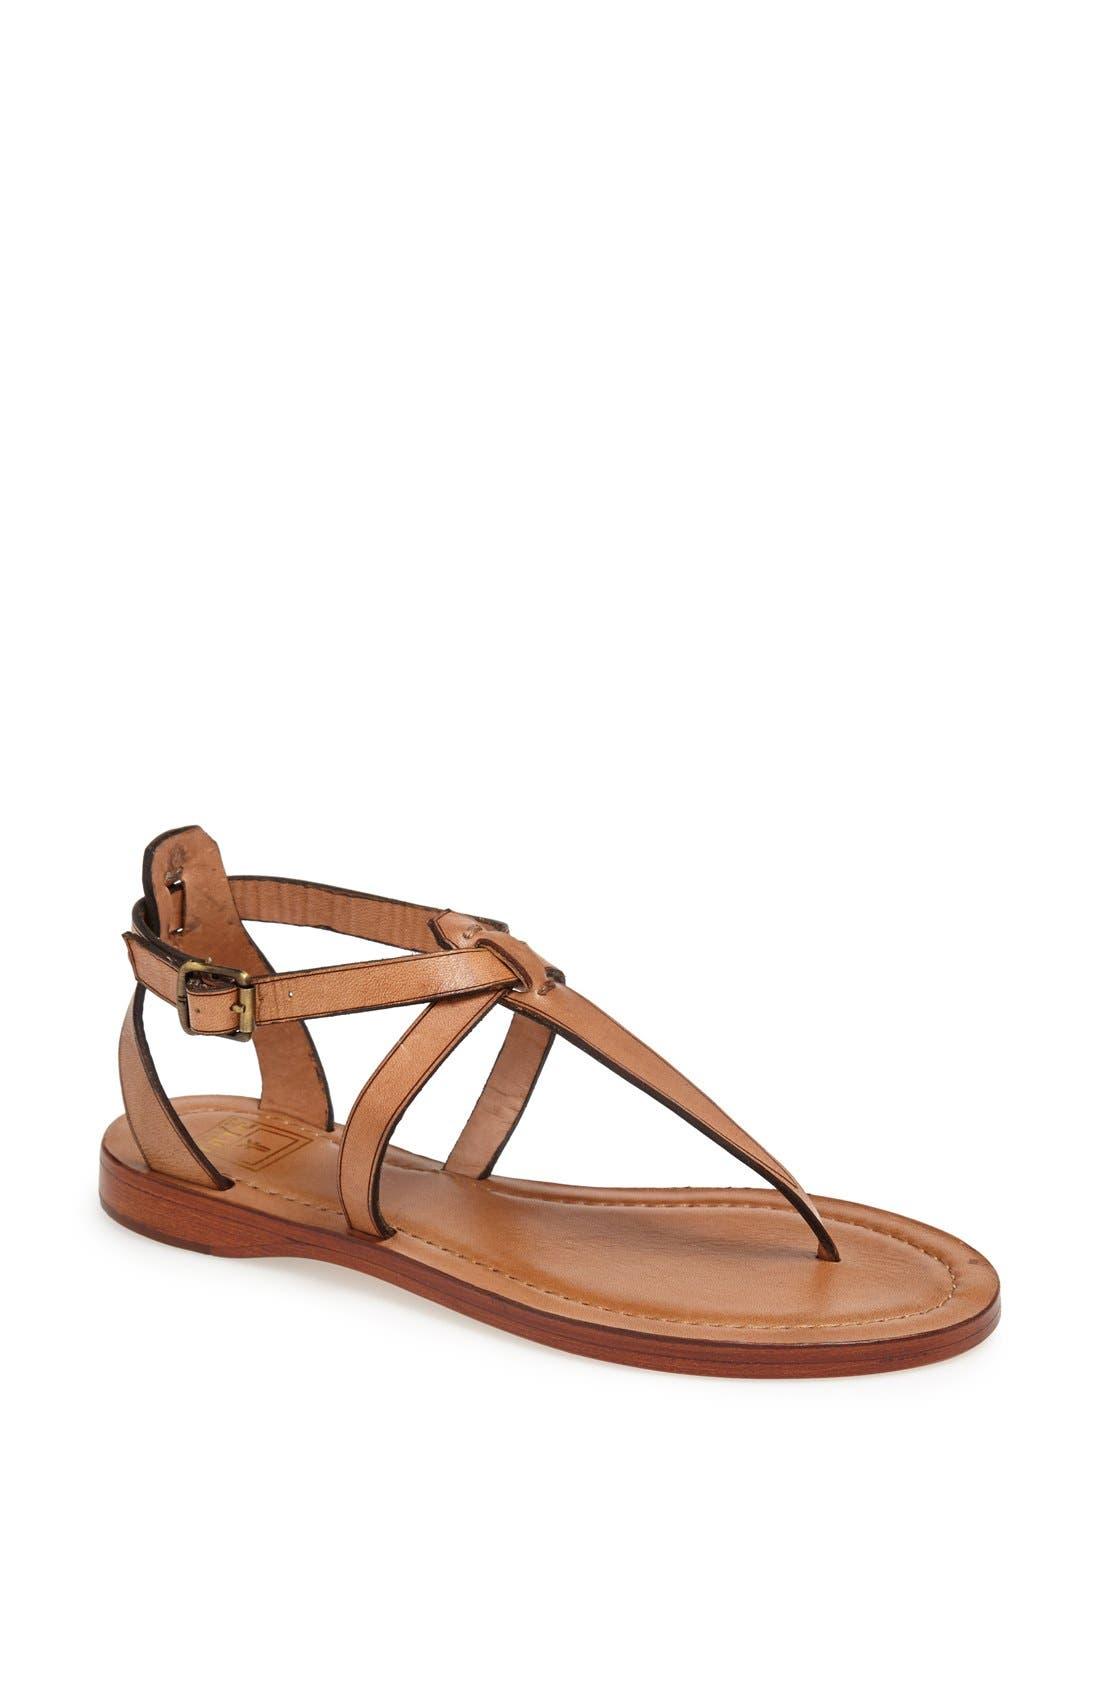 Main Image - Frye 'Rachel' T-Strap Sandal (Women)